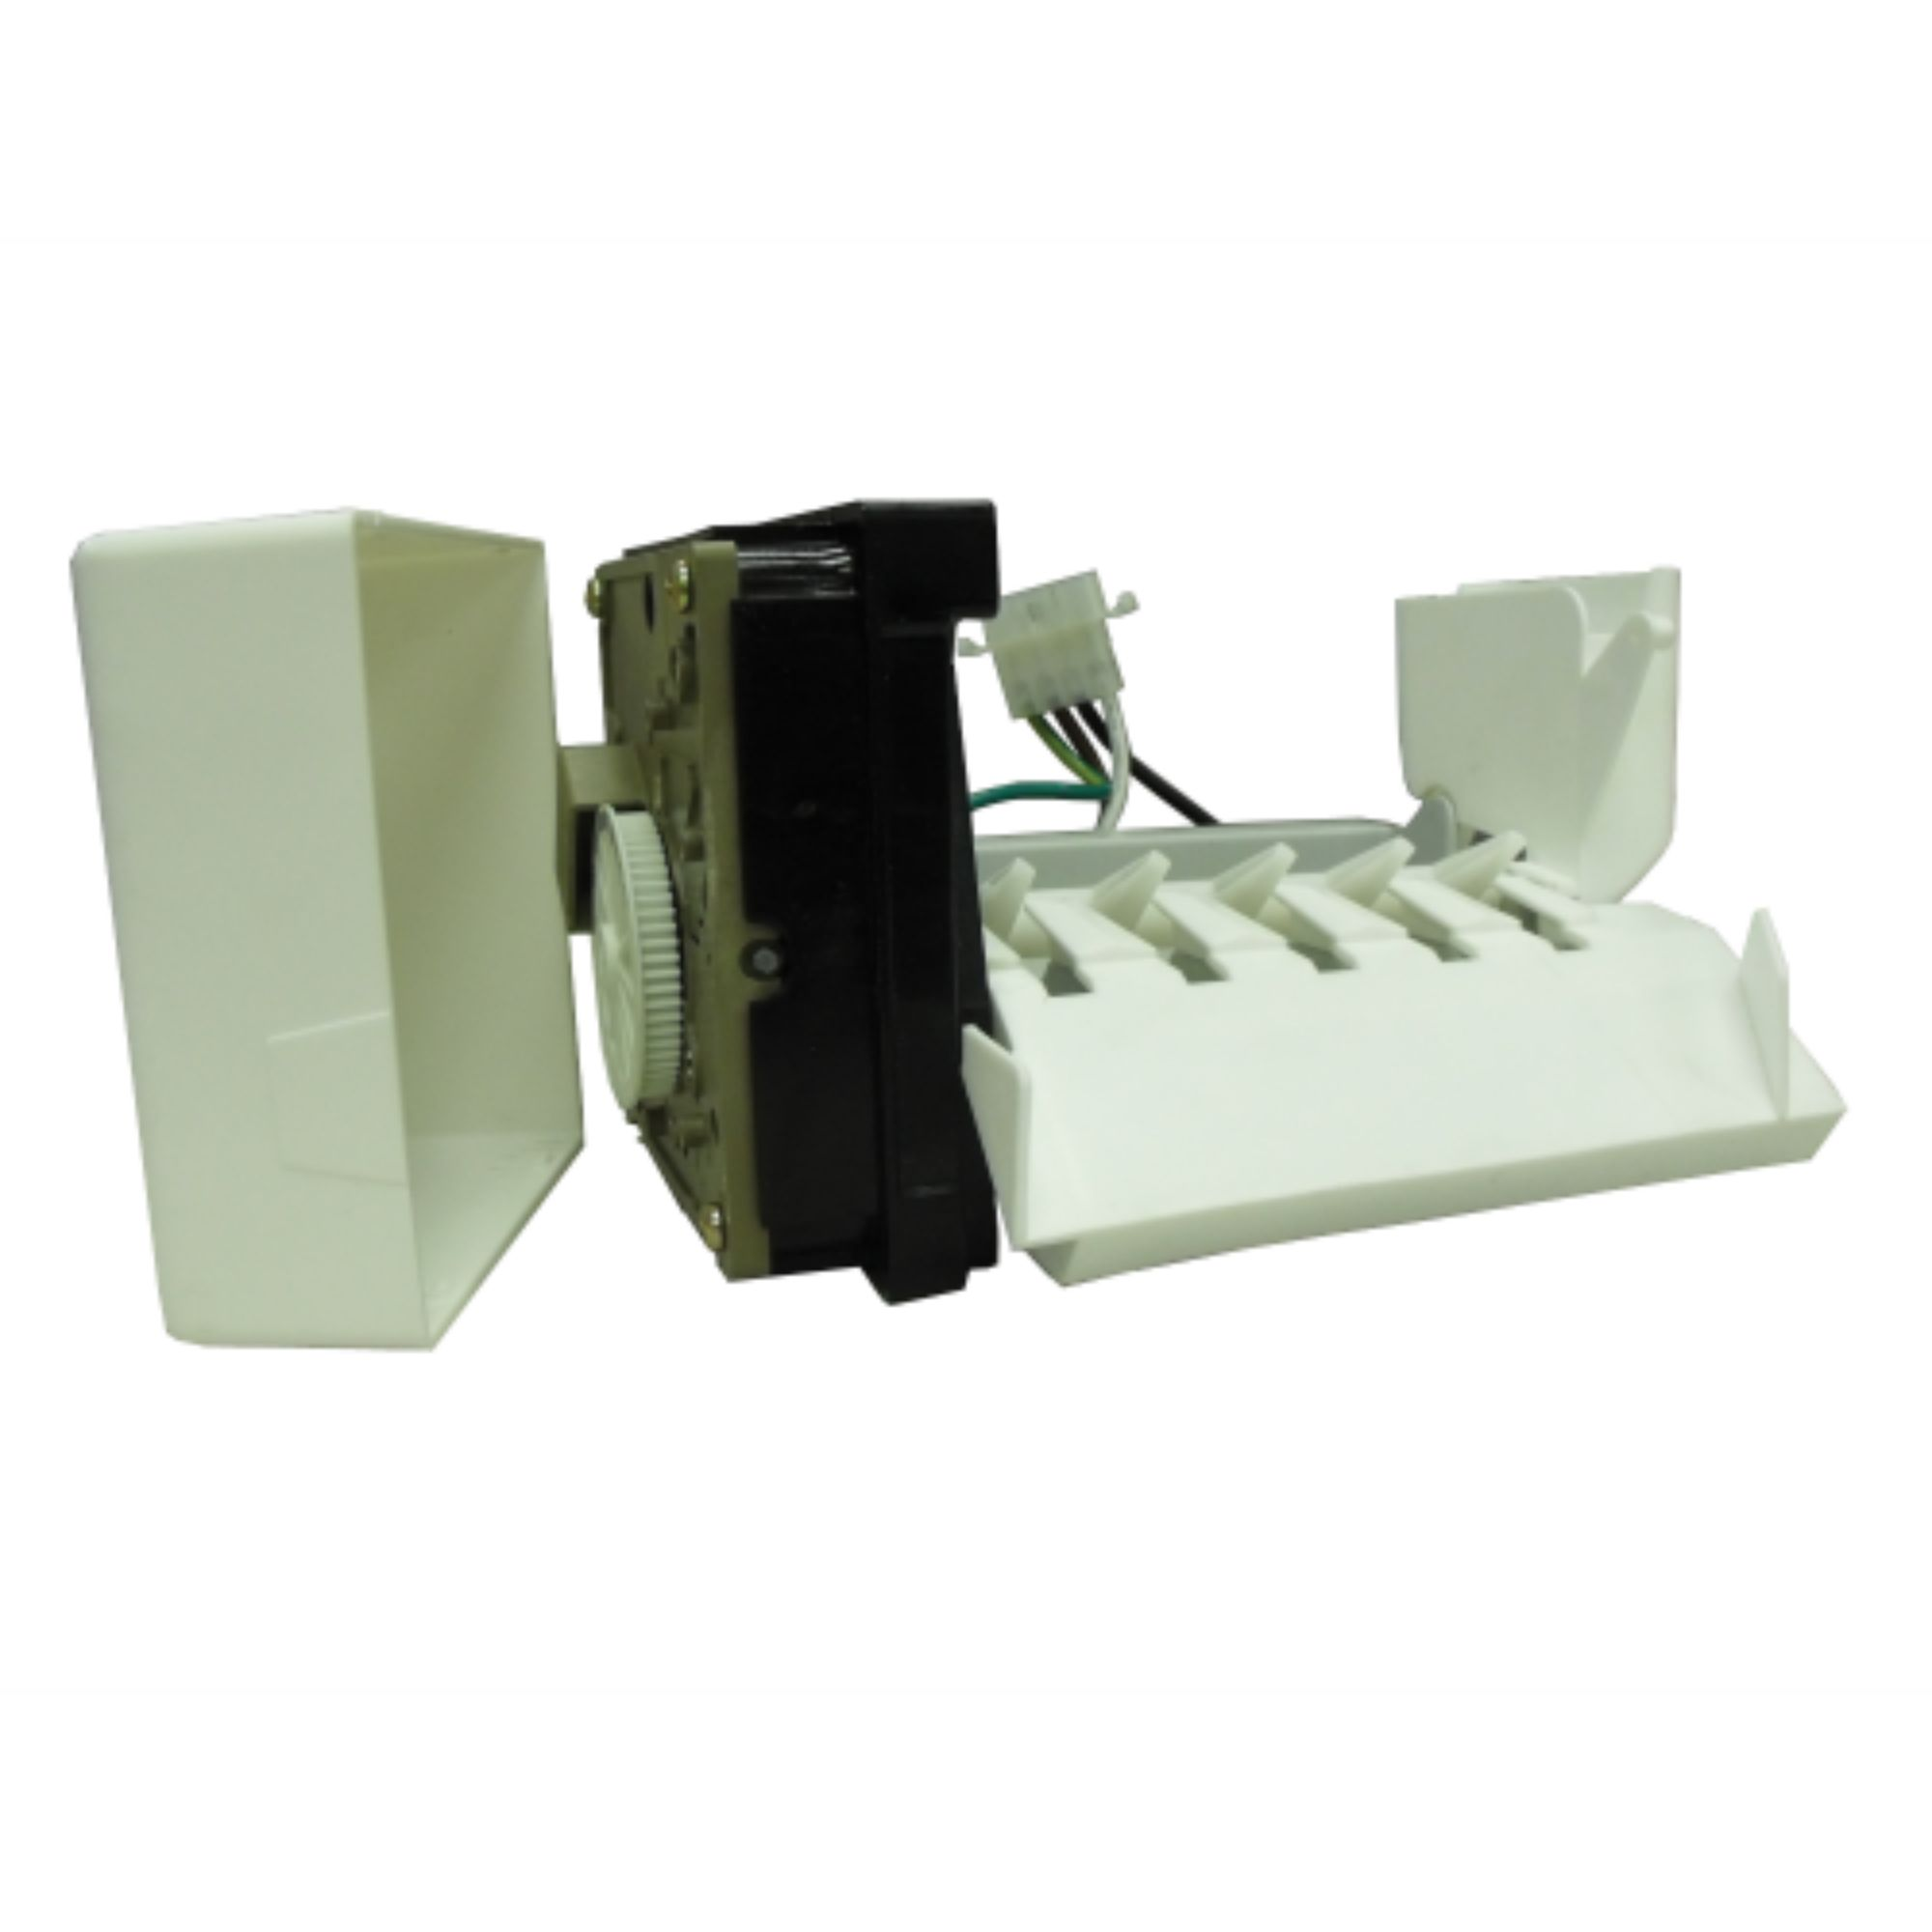 RIM961 W10190961 W10122503 Whirlpool Kenmore Ice Maker